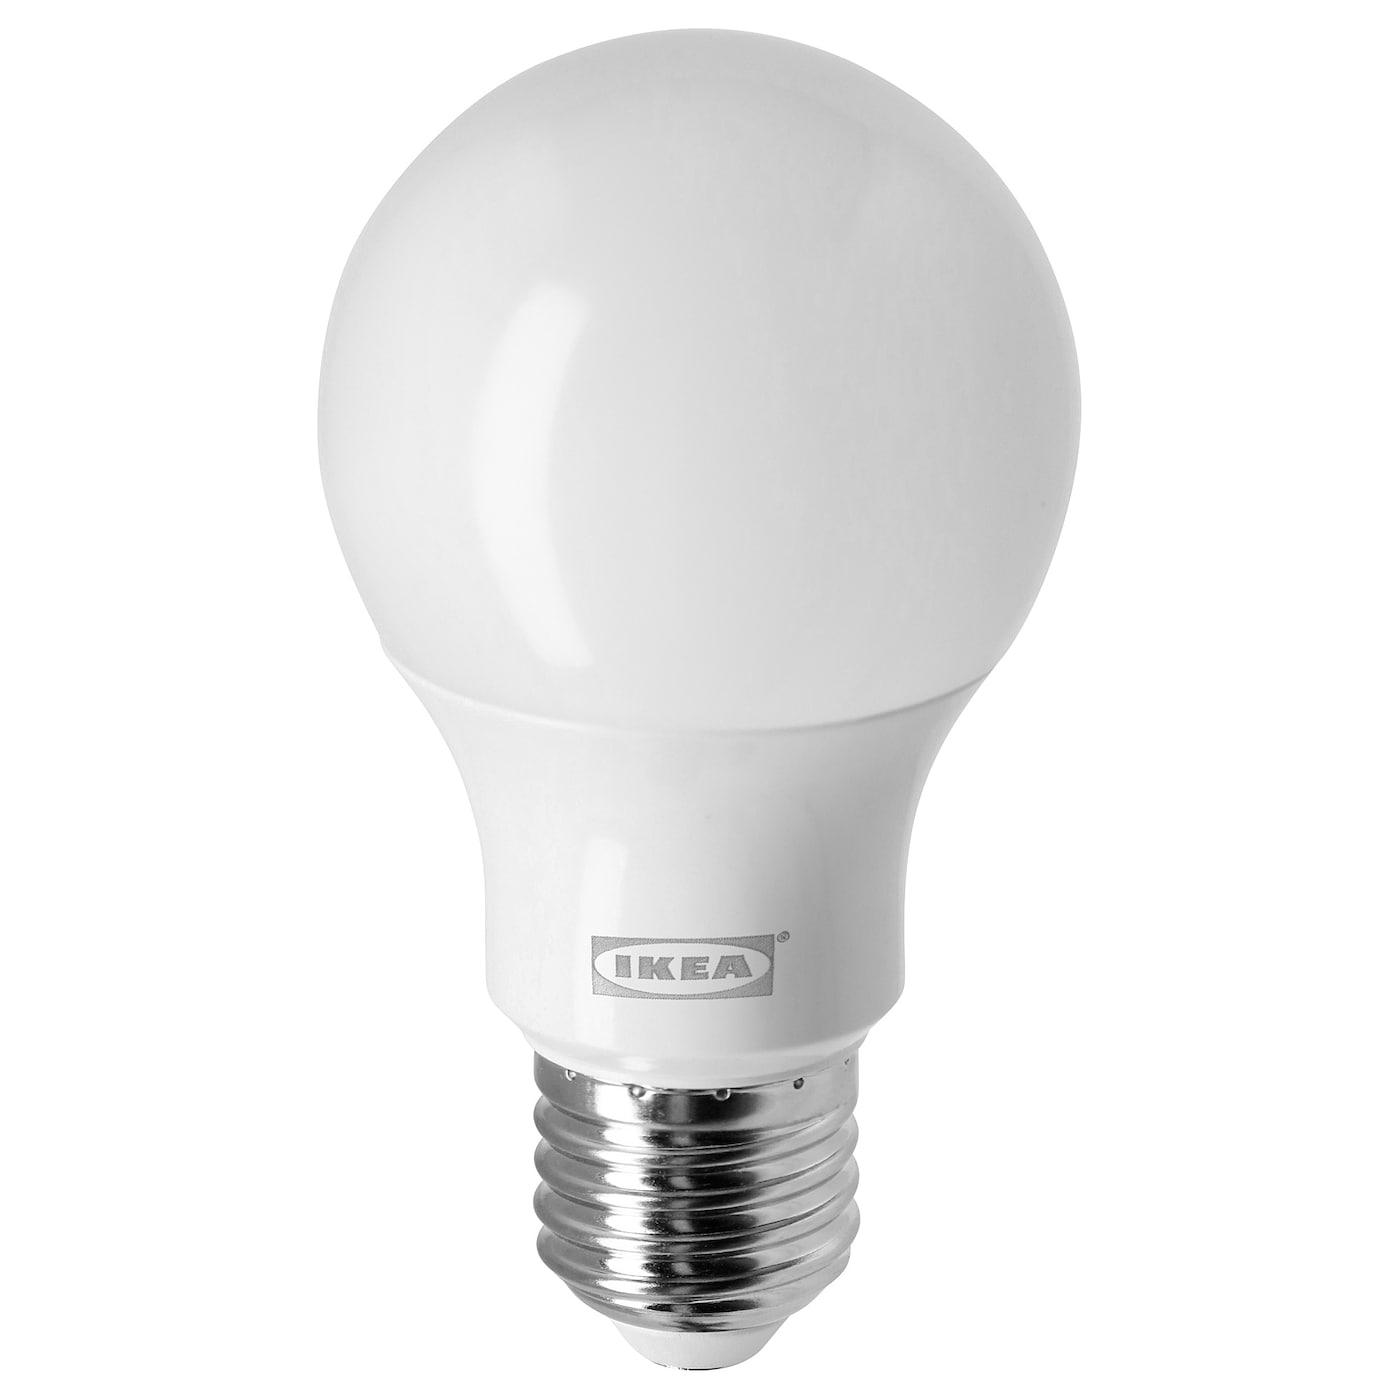 RYET Żarówka LED E27 470 lumenów, kula opalowa biel